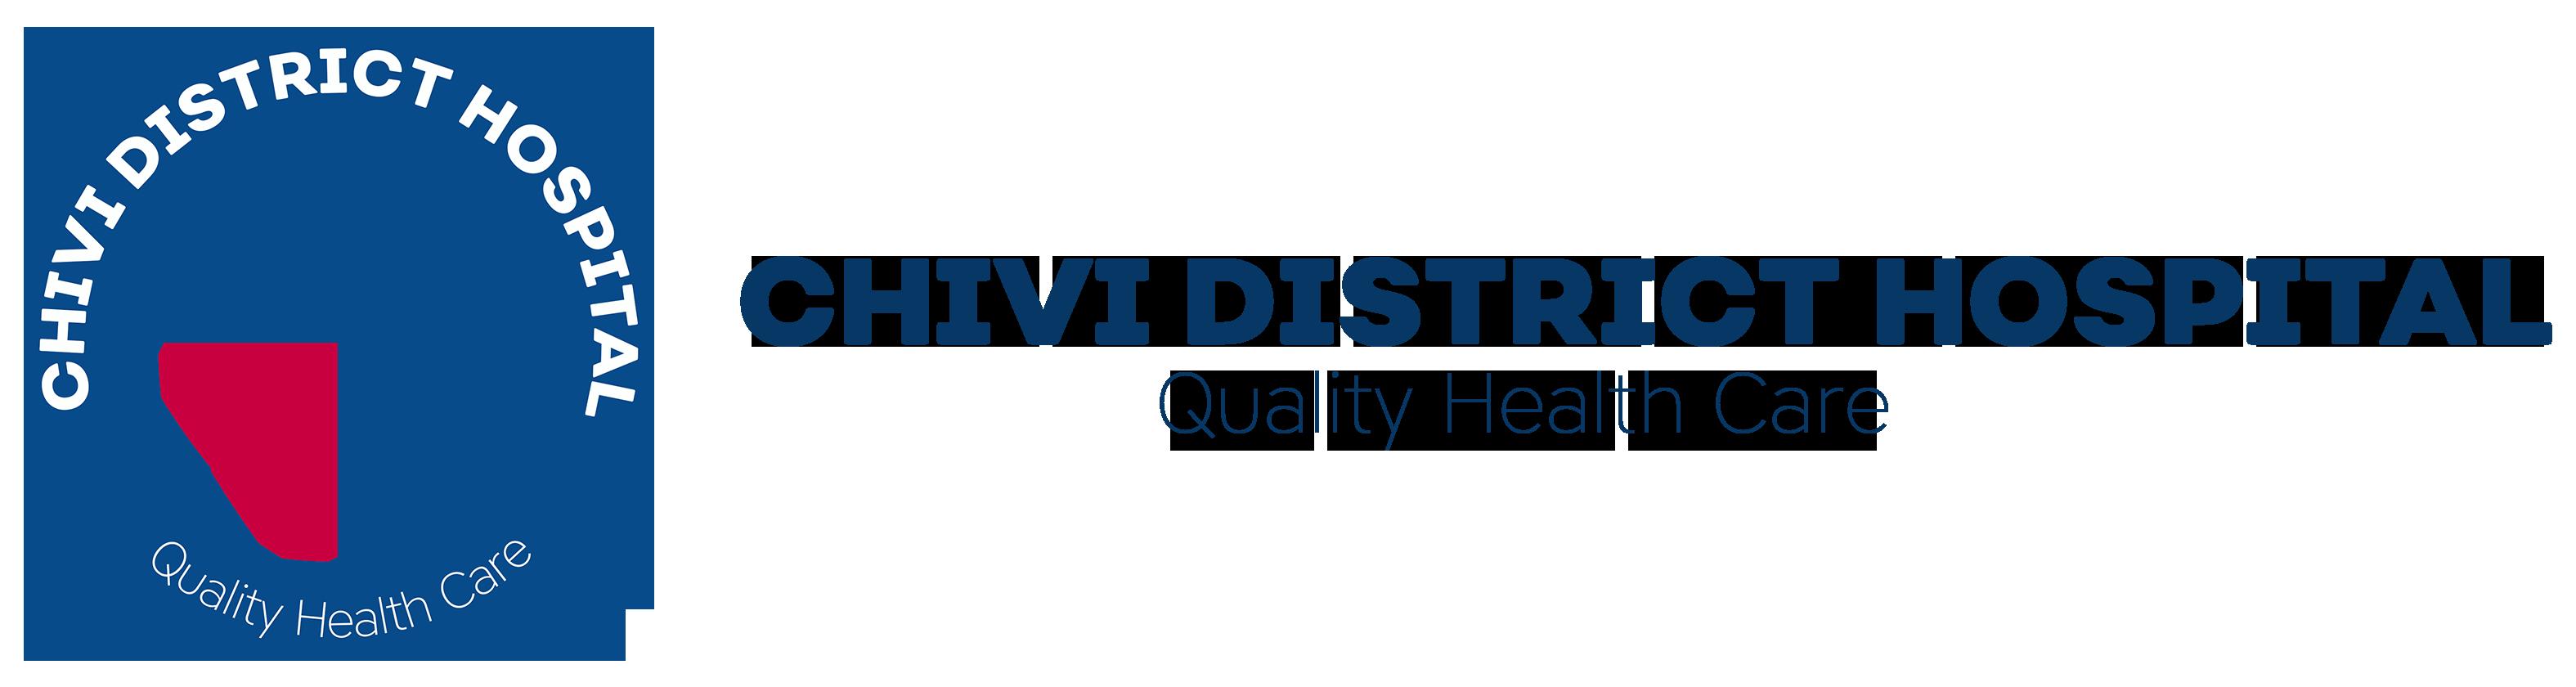 Chivi District Hospital